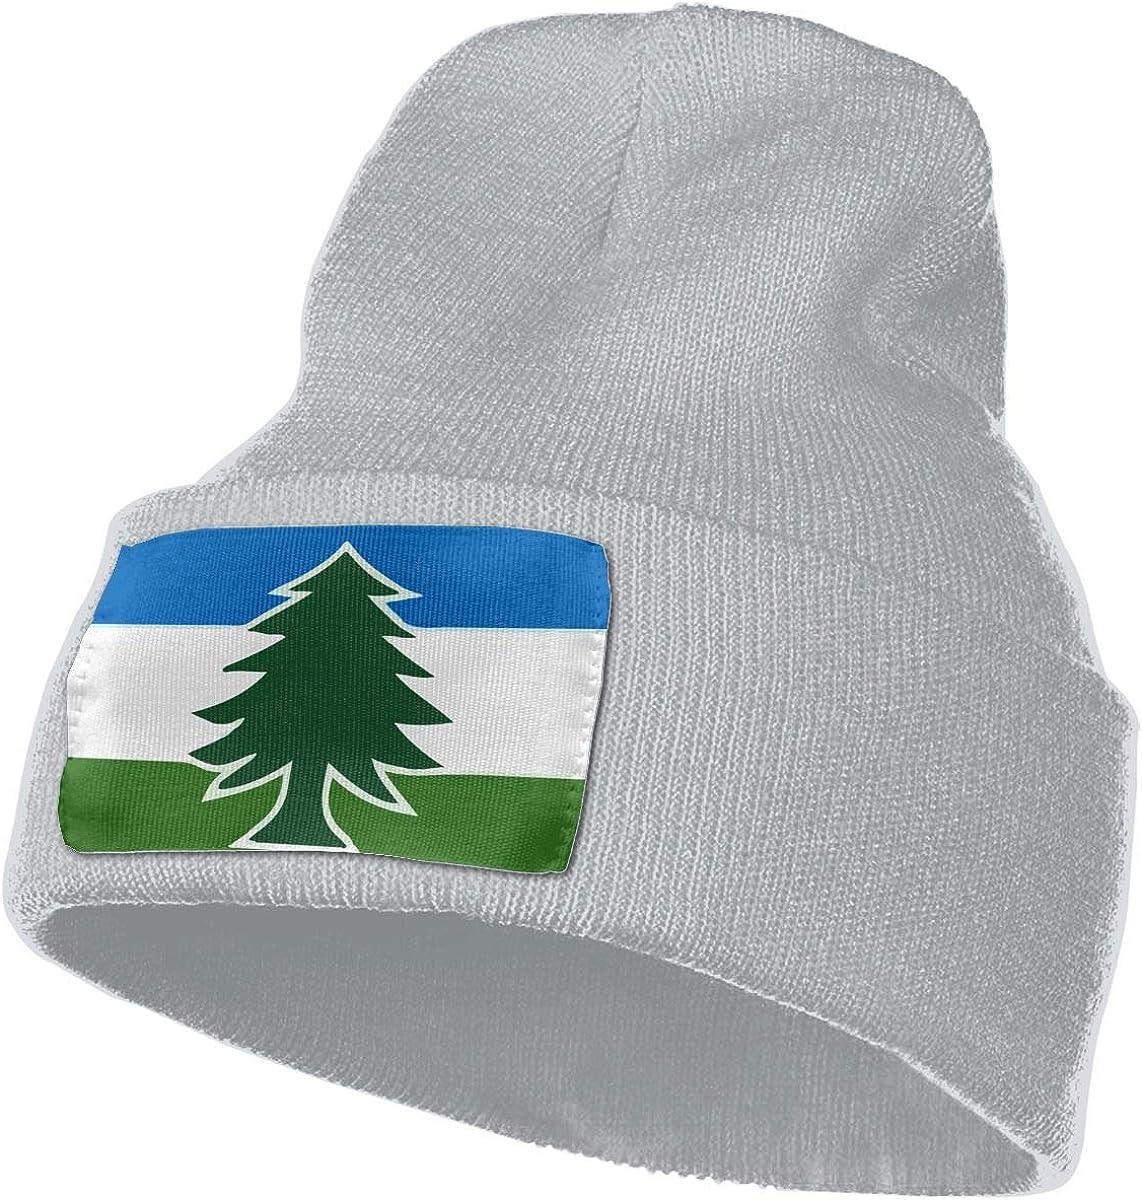 TAOMAP89 Variation of The Doug Flag Men /& Women Skull Caps Winter Warm Stretchy Knitting Beanie Hats